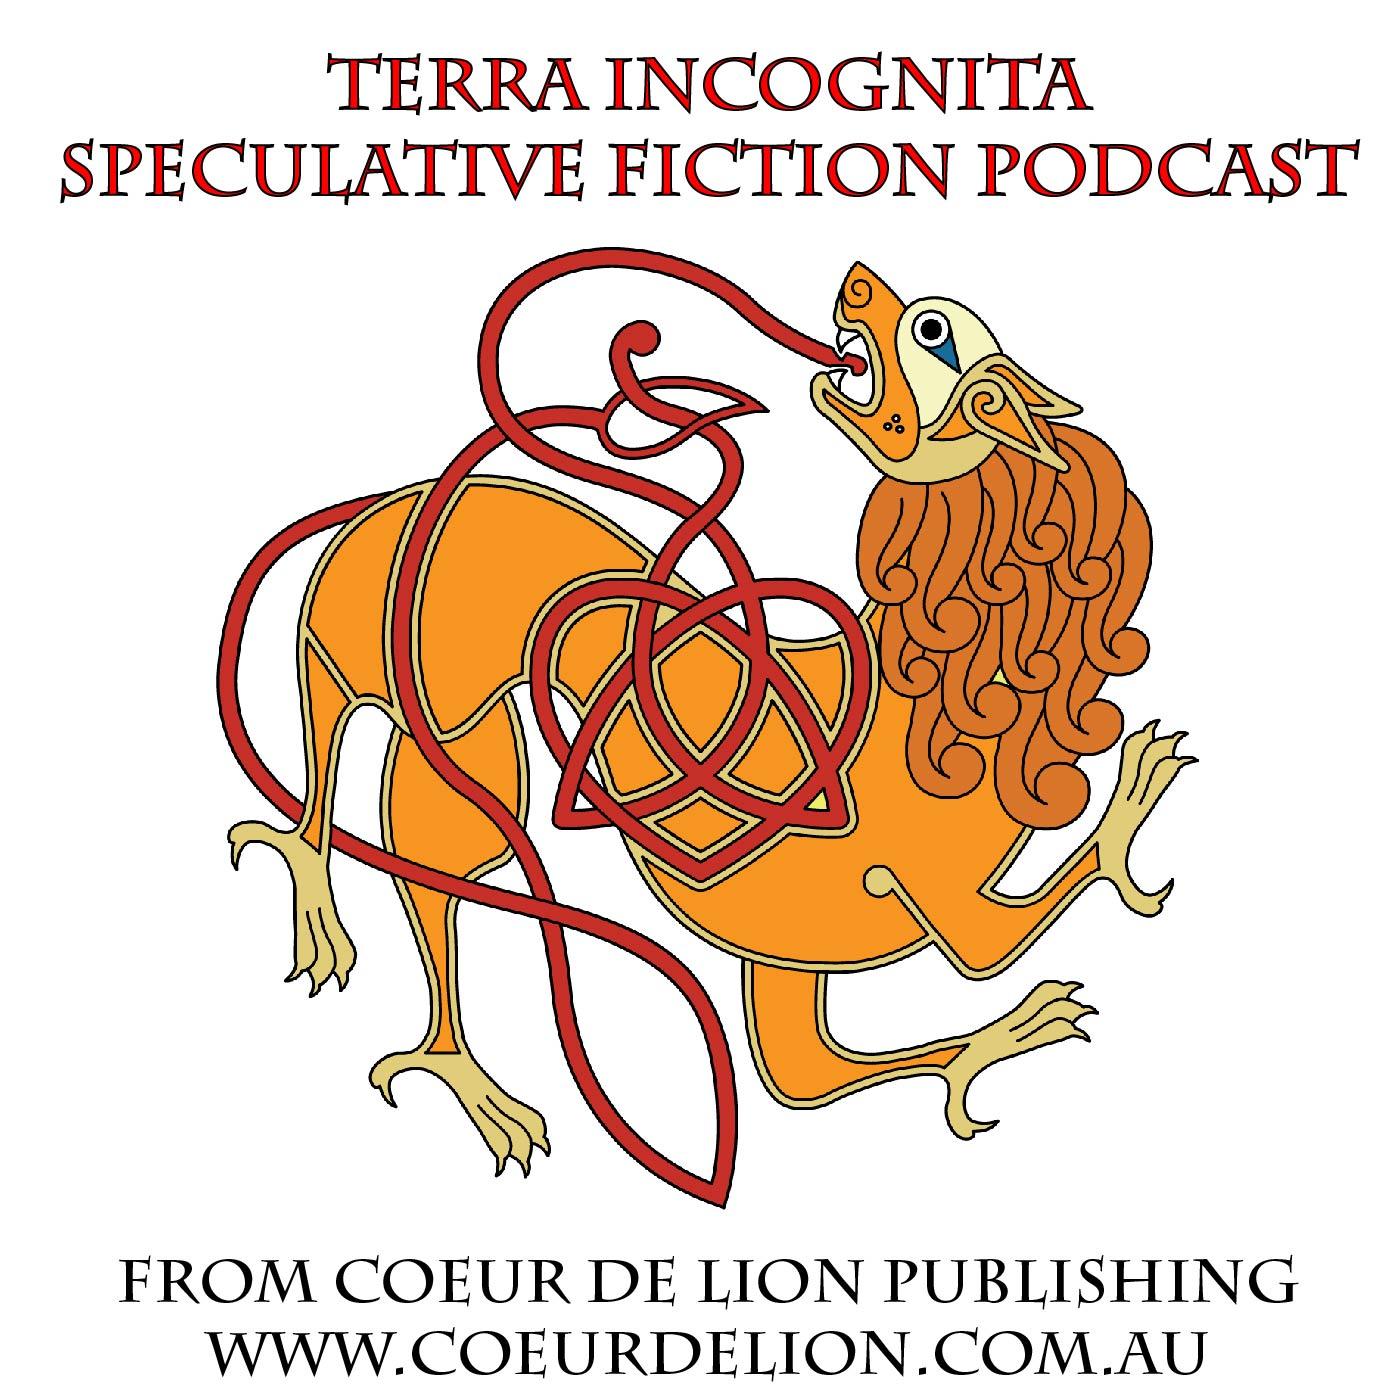 Terra Incognita Speculative Fiction